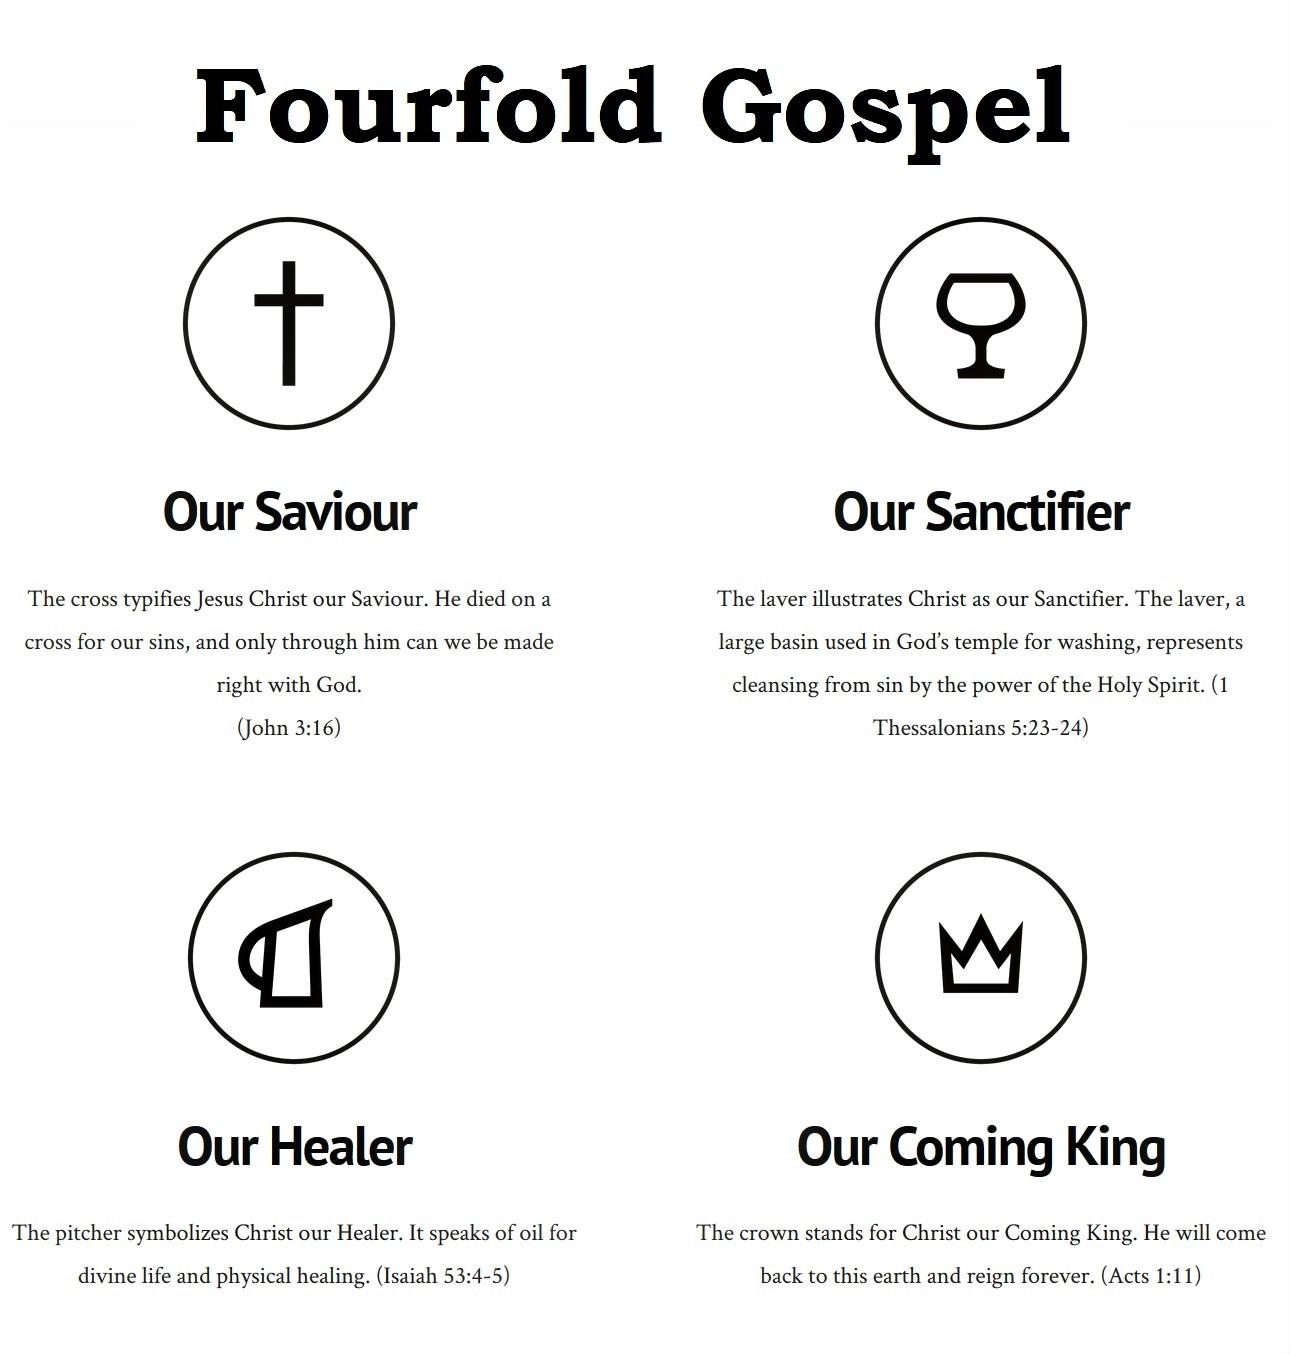 Fourfold Gospel photo